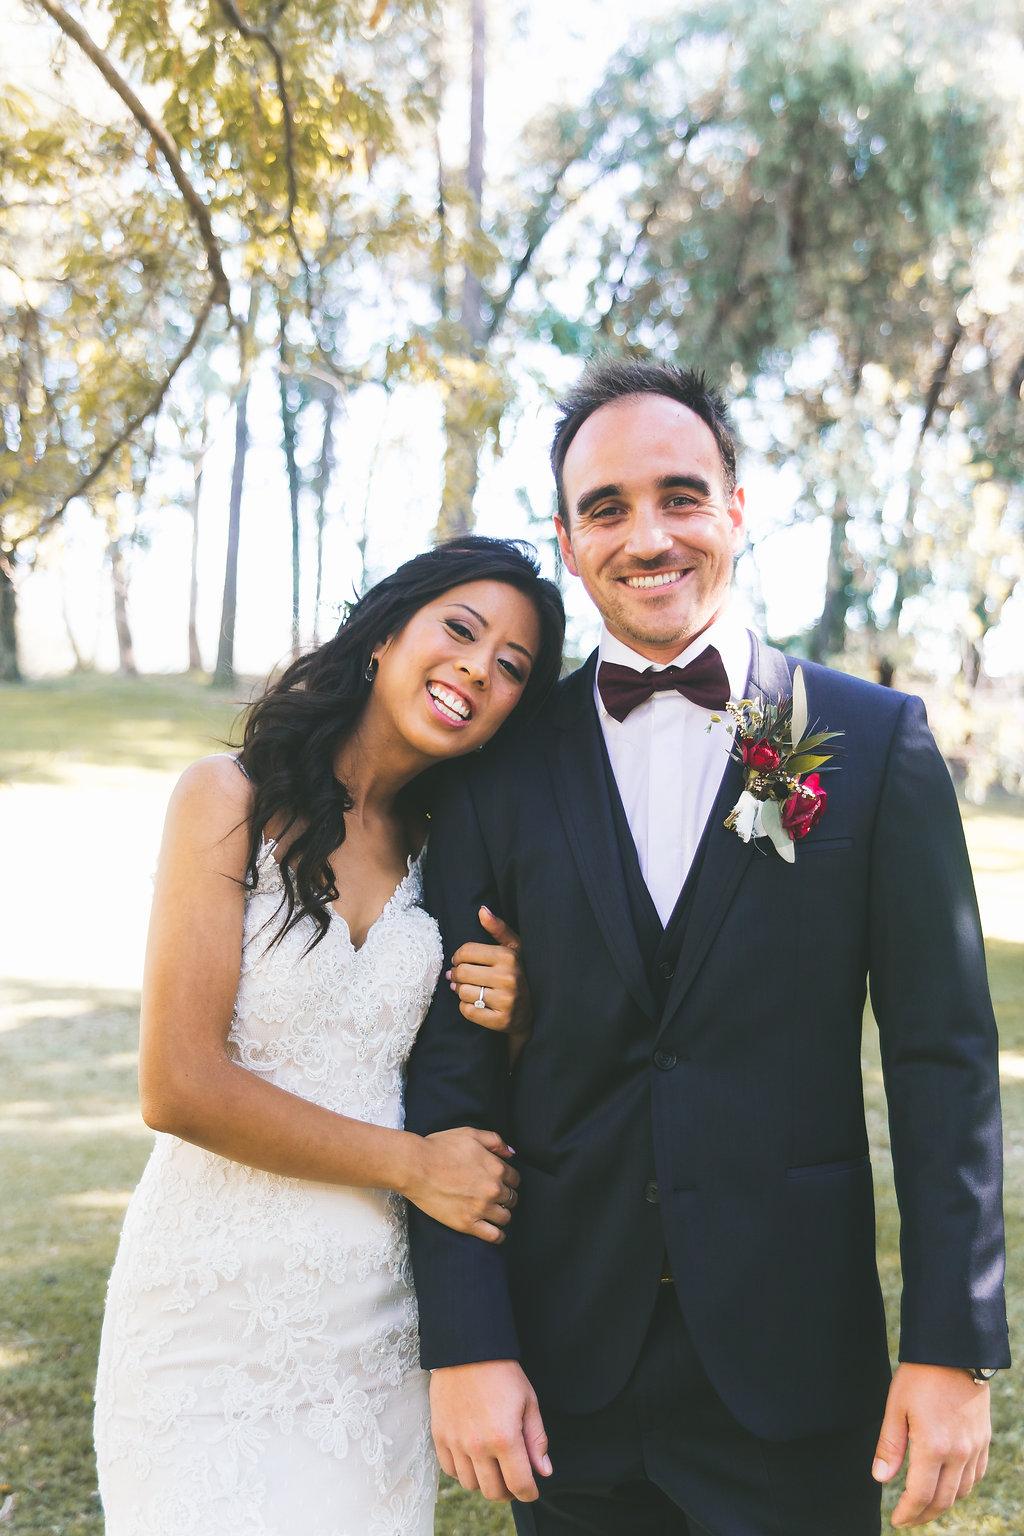 Temecula Creek Inn Moody burgundy & marsala wedding by San Diego wedding florist, Compass Floral.